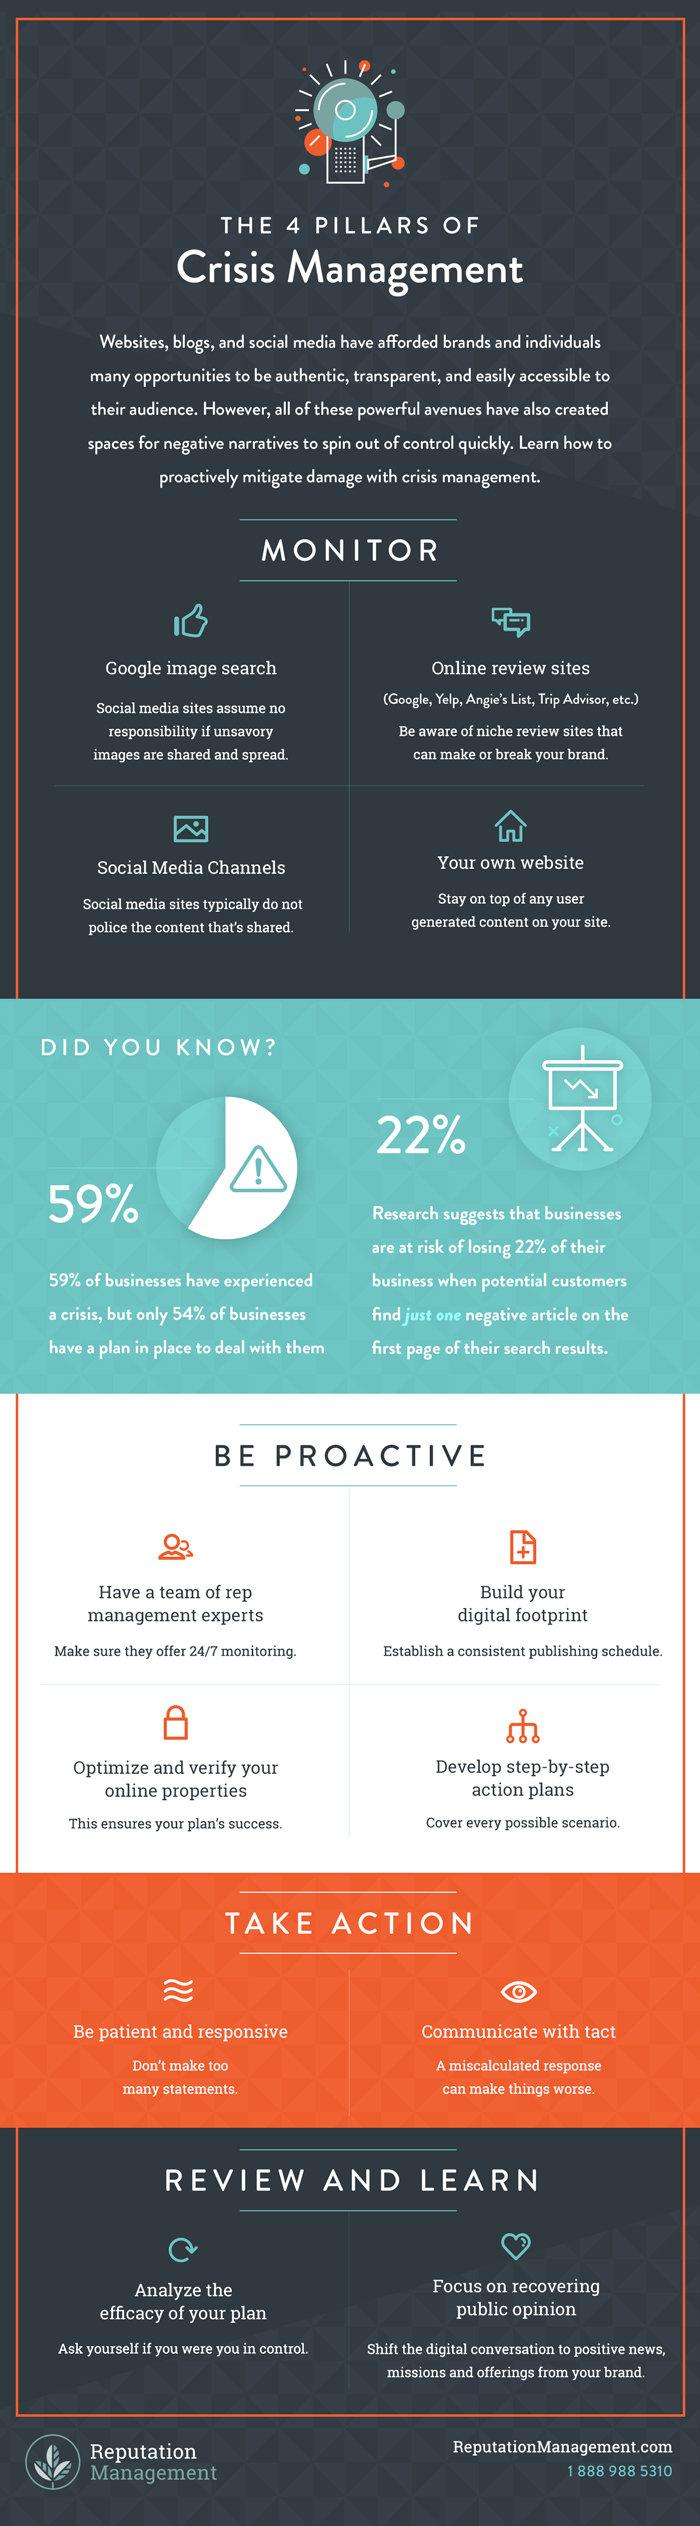 4 pillars of Crisis Management - infographic